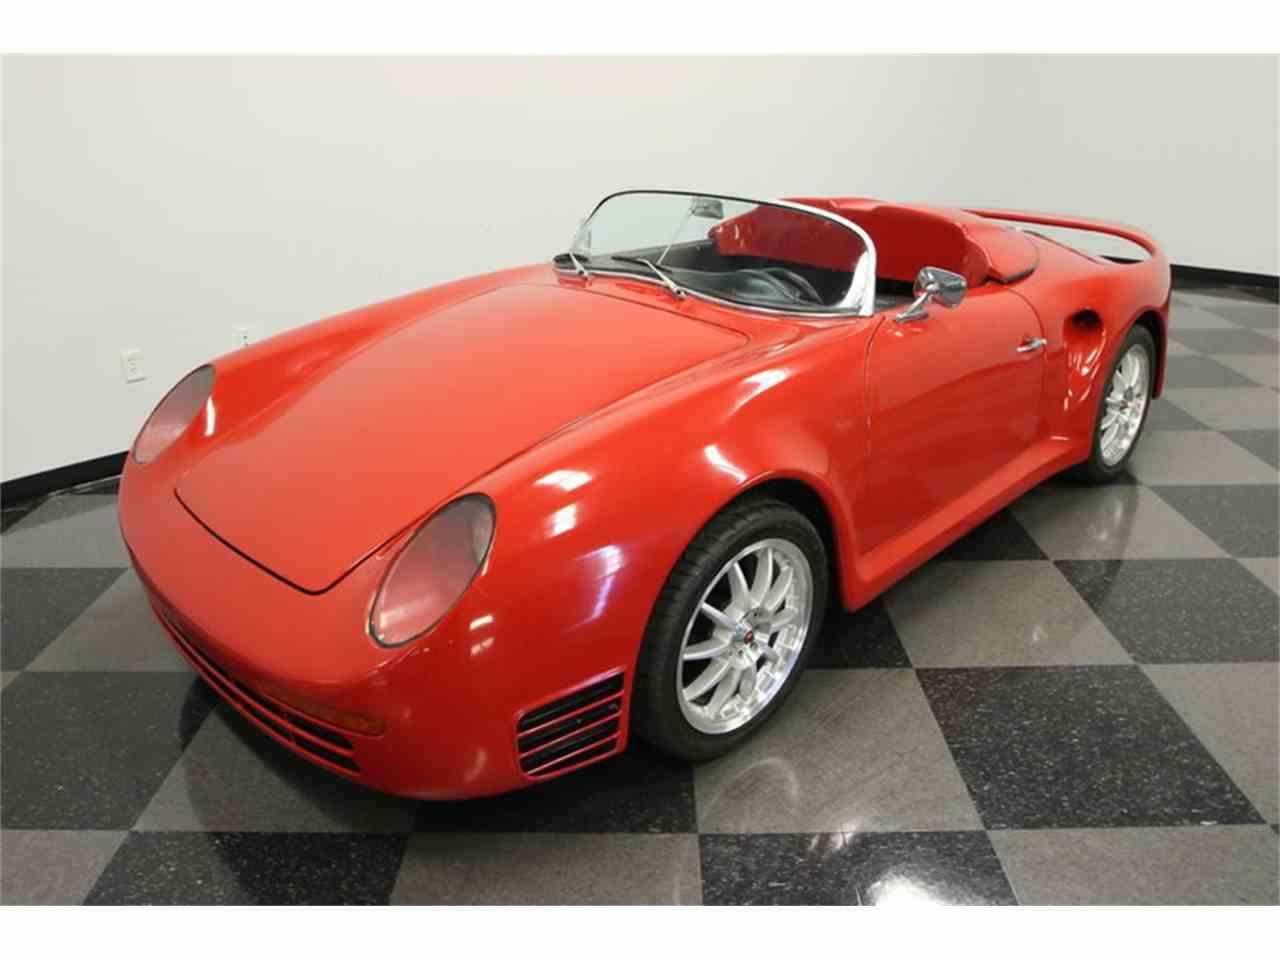 Large Picture of '94 Porsche 359 Replica located in Florida - $18,900.00 - LTAU